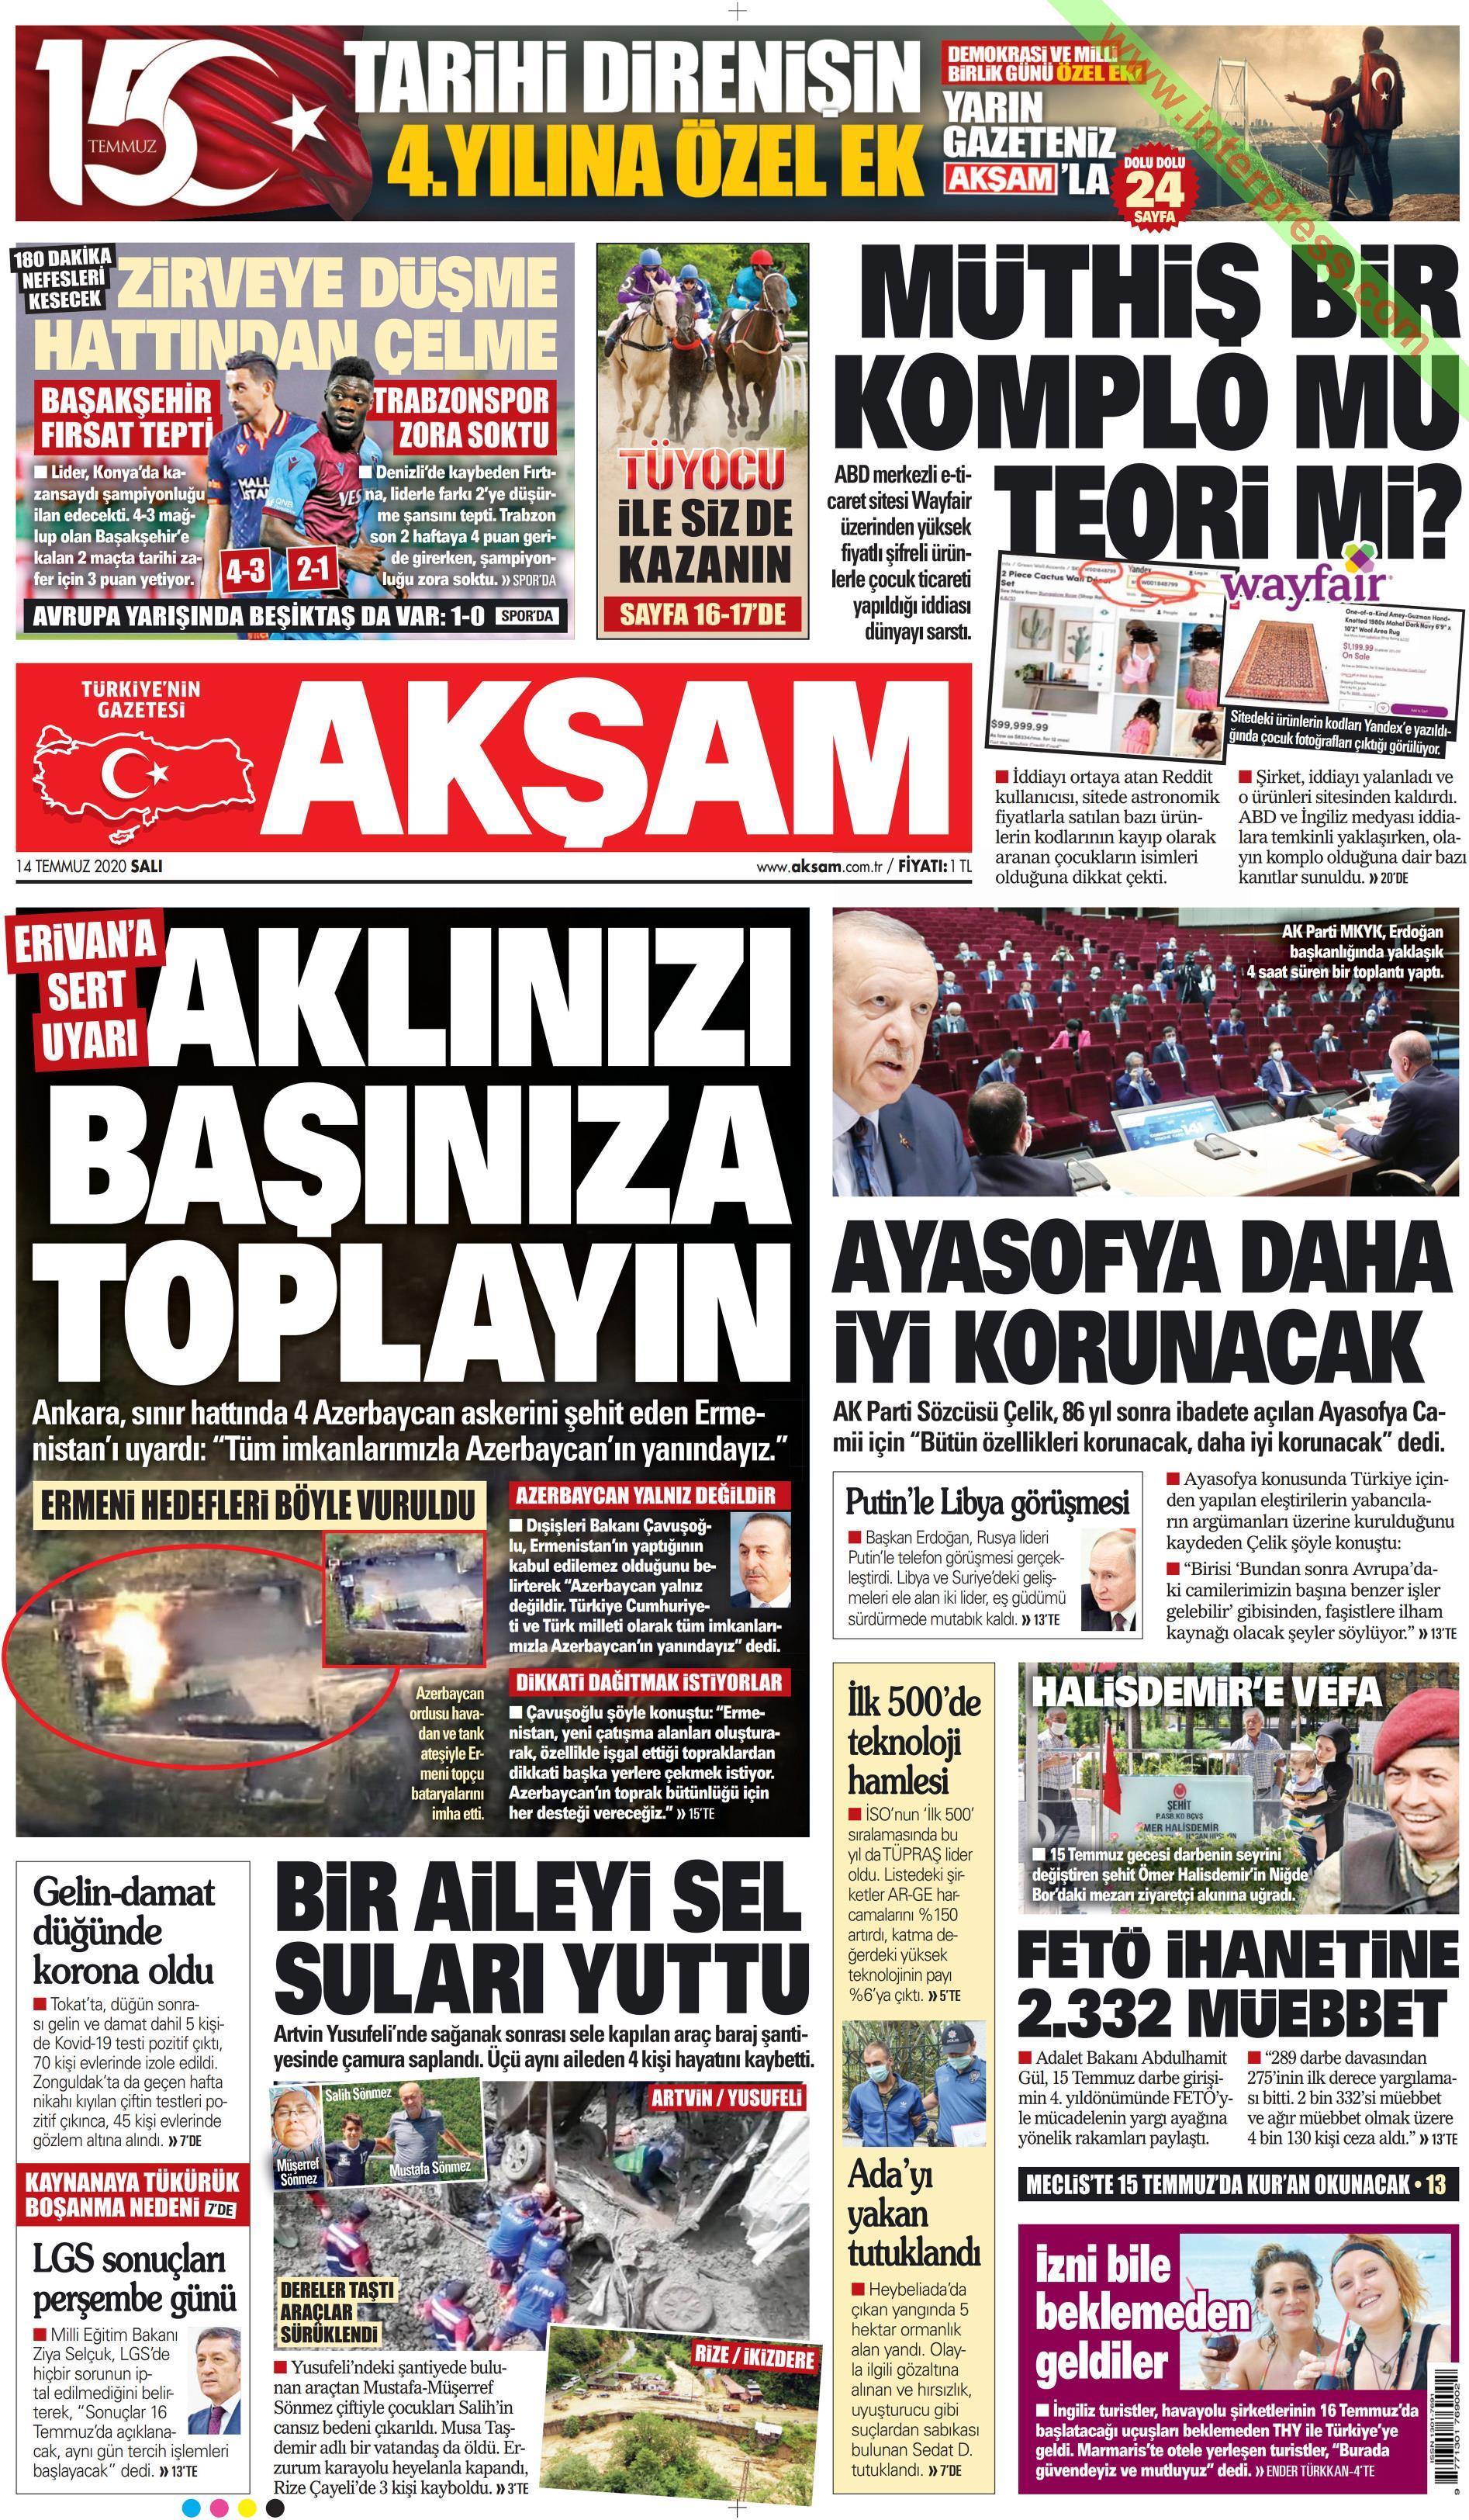 Akşam gazetesi manşet ilk sayfa oku